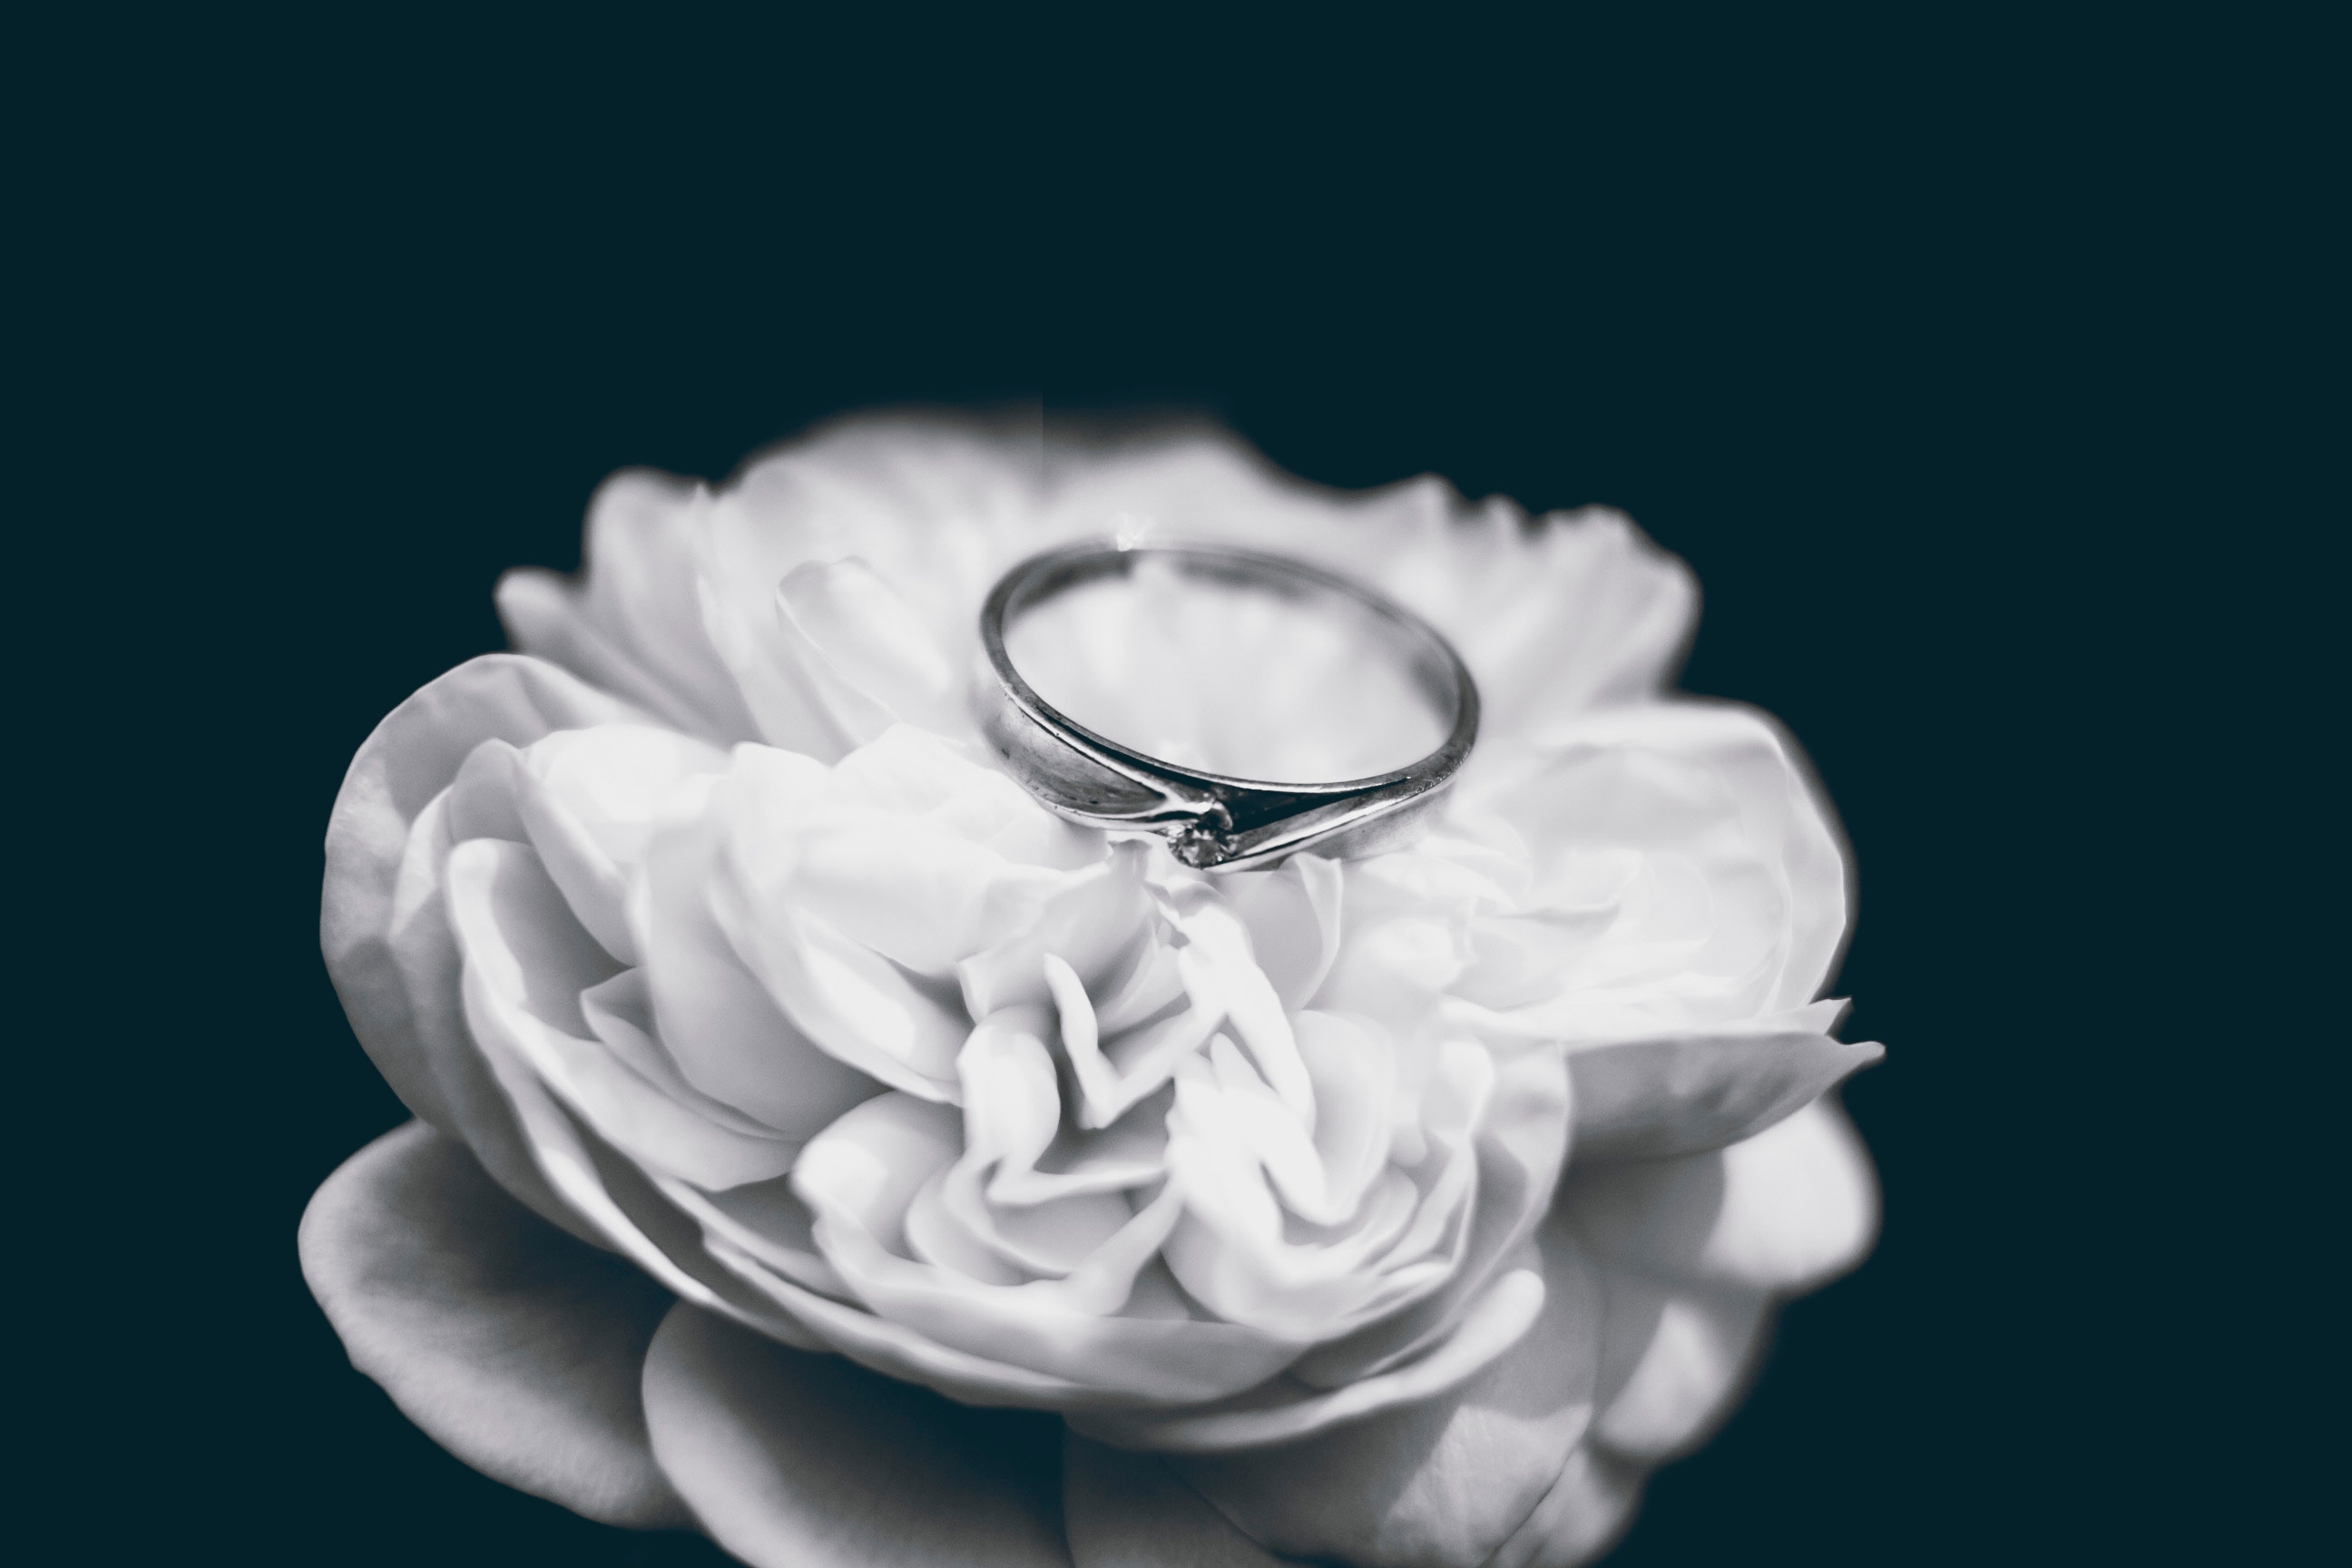 Photo of Silver Ring, Rose, Romantic, Wedding, Wedding ring, HQ Photo